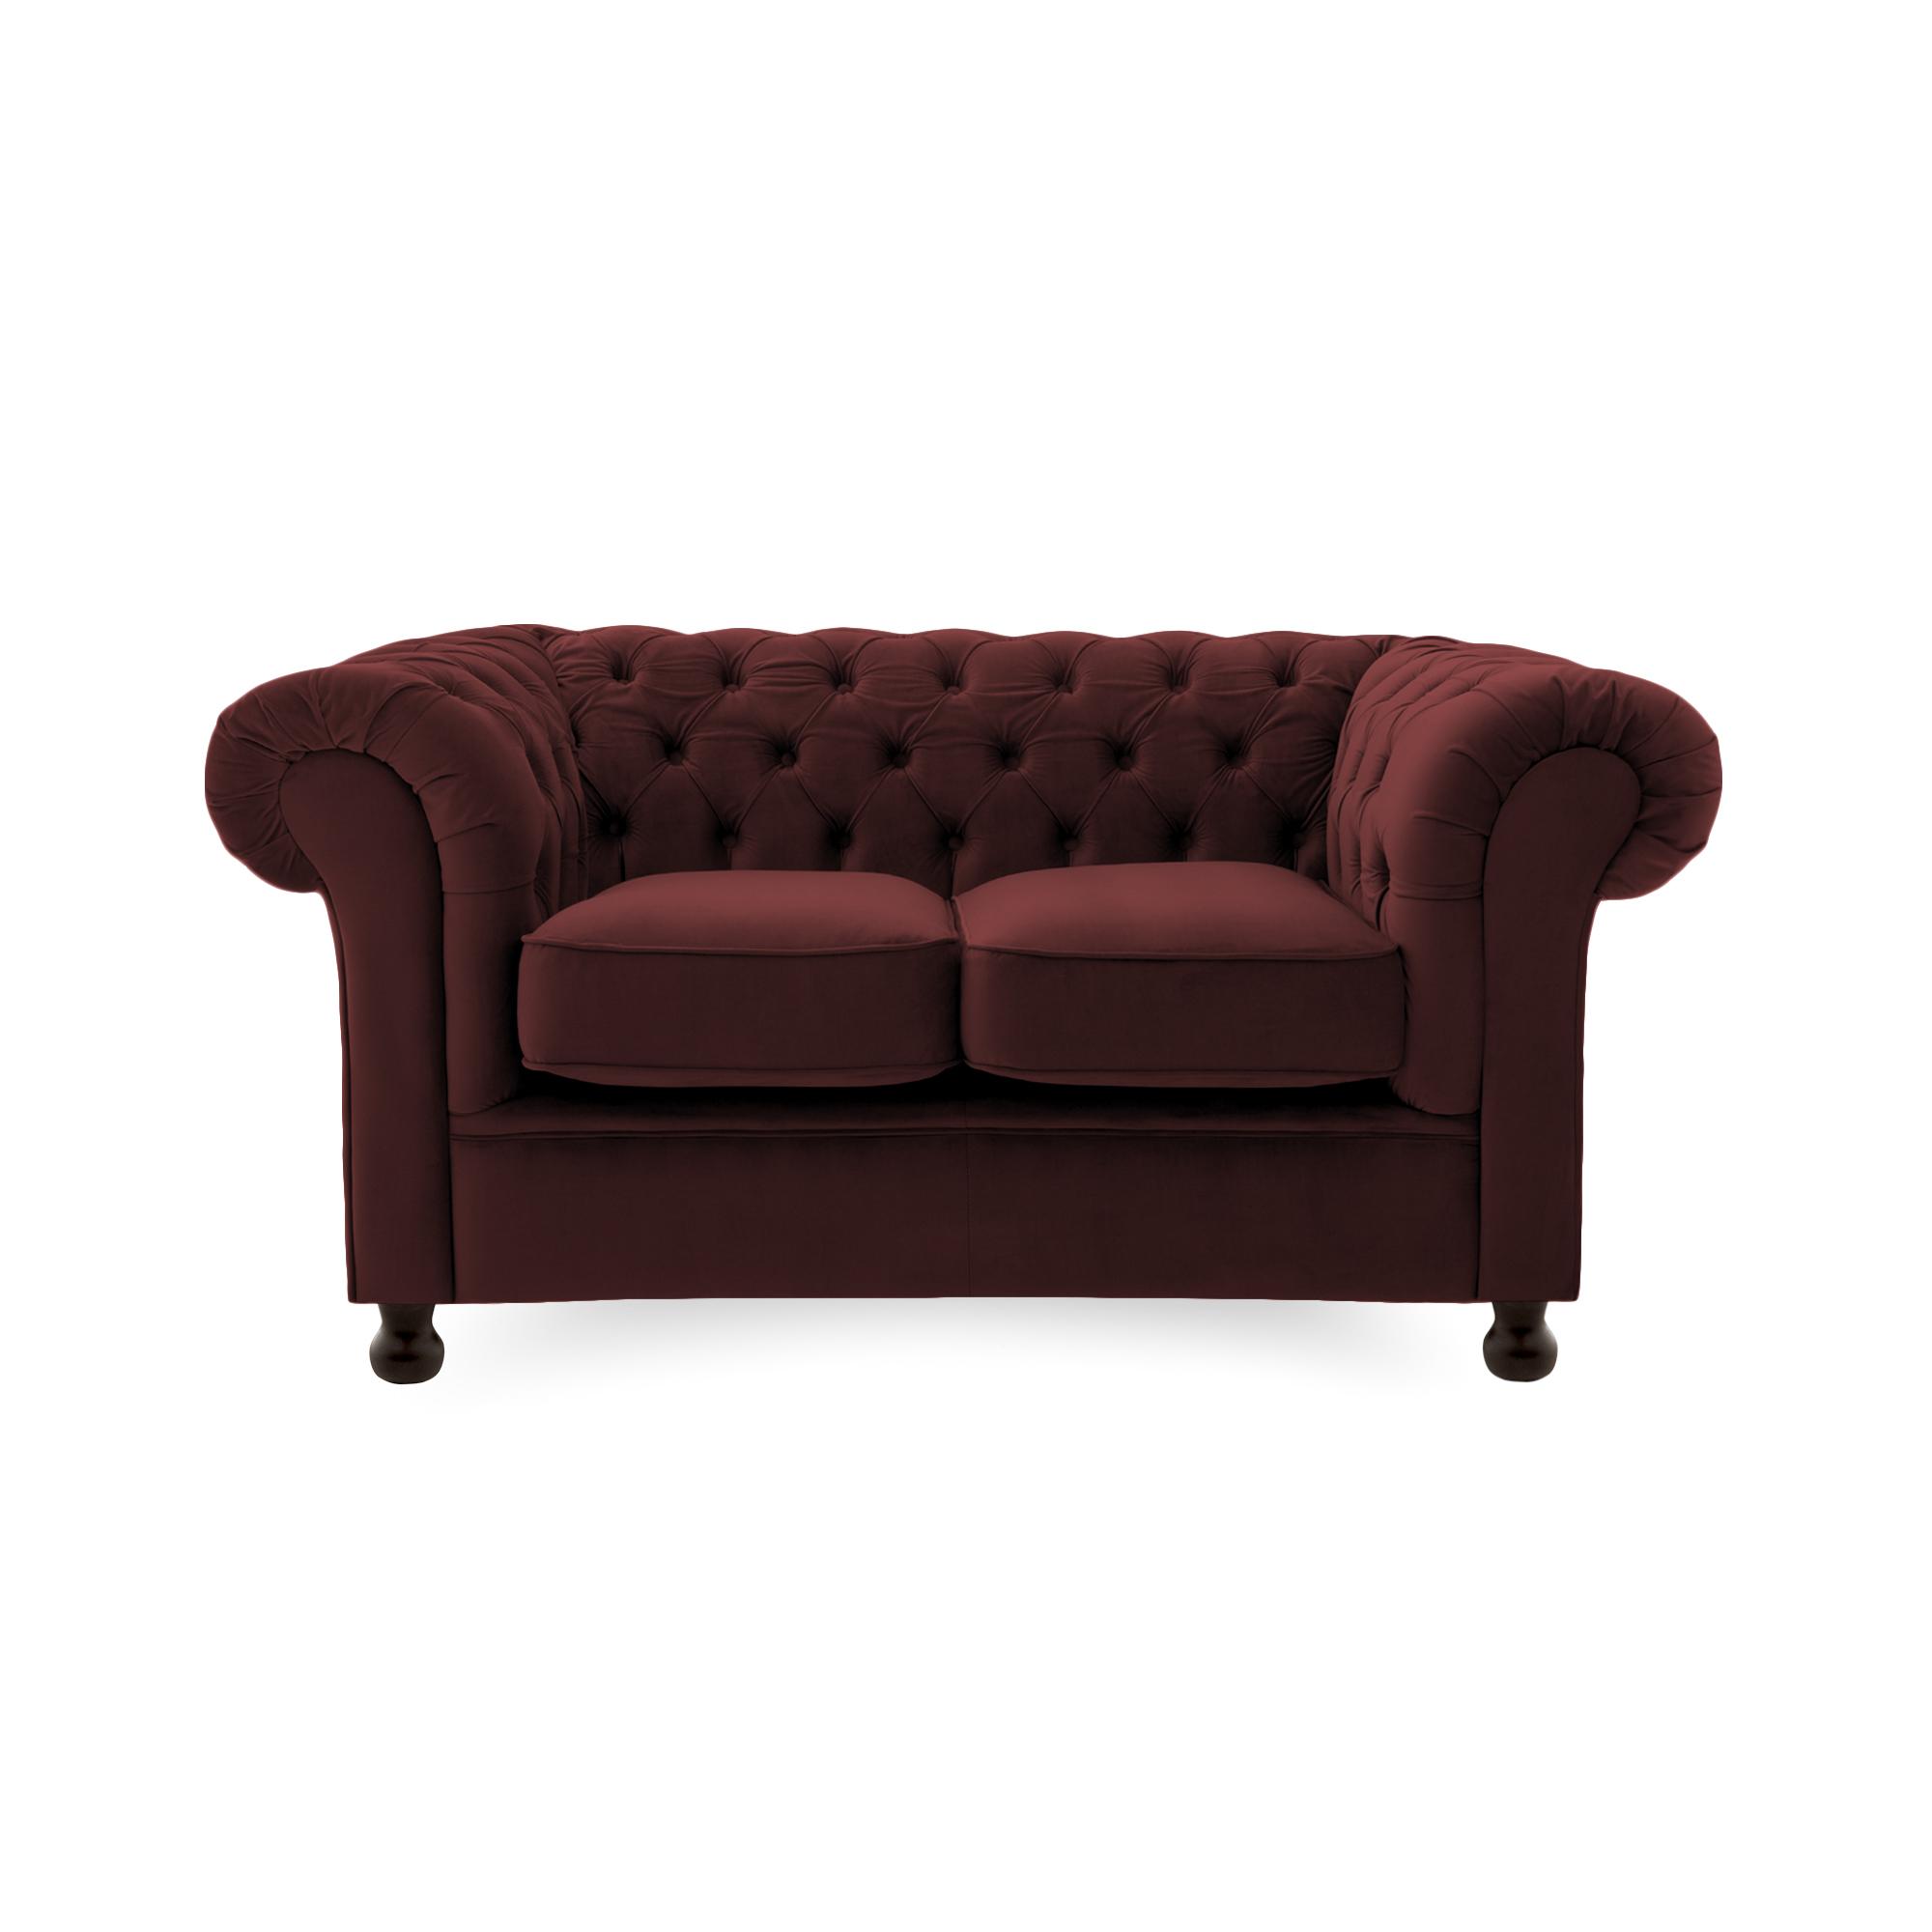 Canapea Fixa 2 locuri Chesterfield Burgundy Red